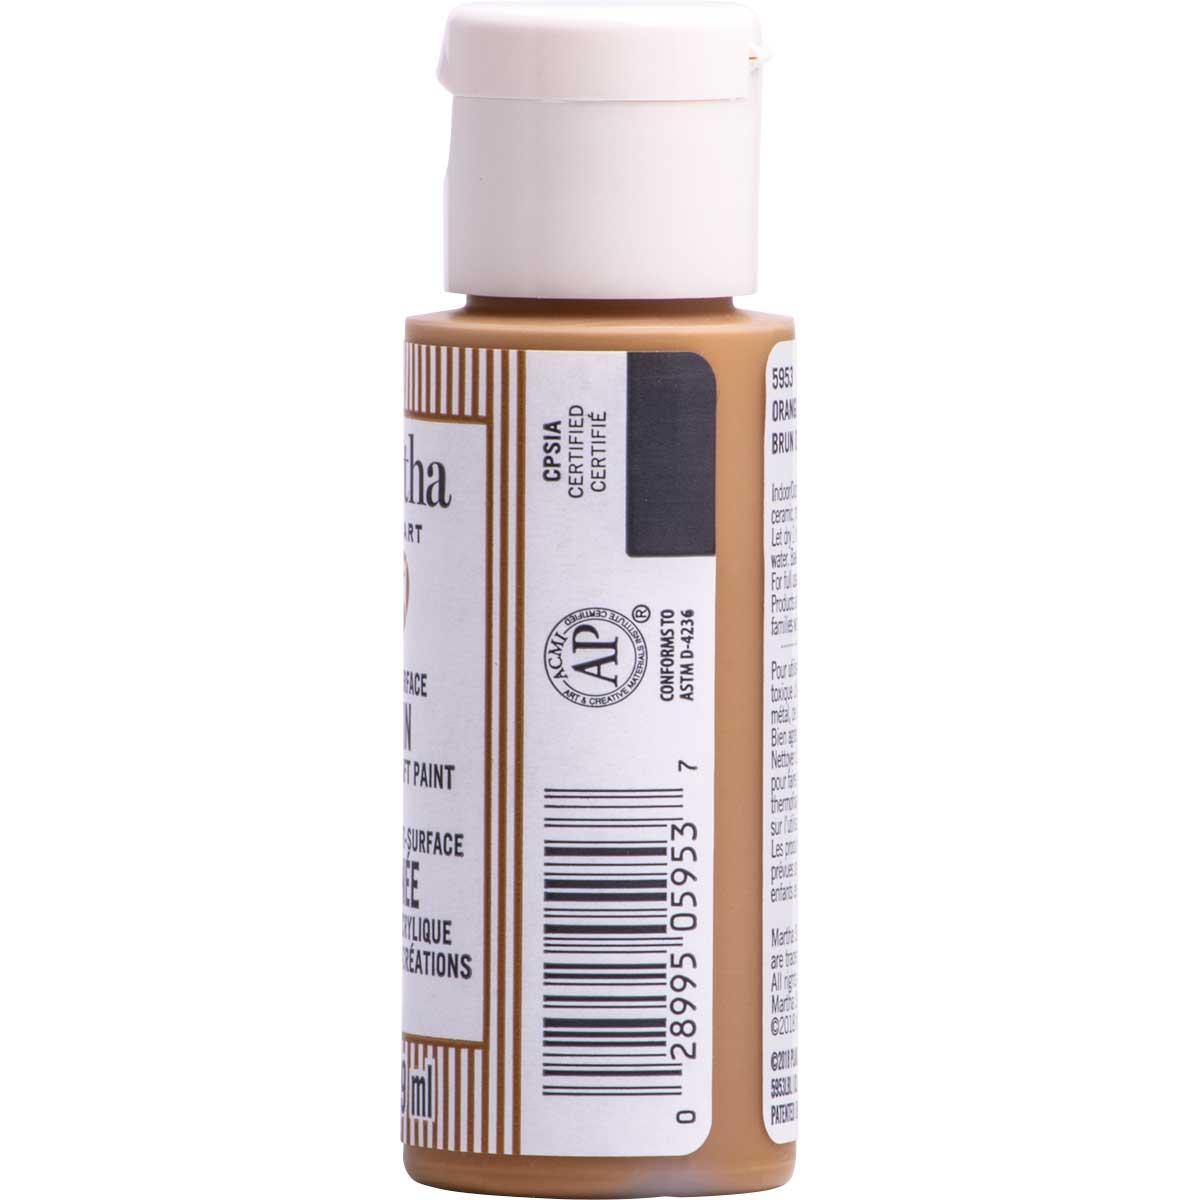 Martha Stewart ® Multi-Surface Satin Acrylic Craft Paint CPSIA - Orangutan Brown, 2 oz. - 5953